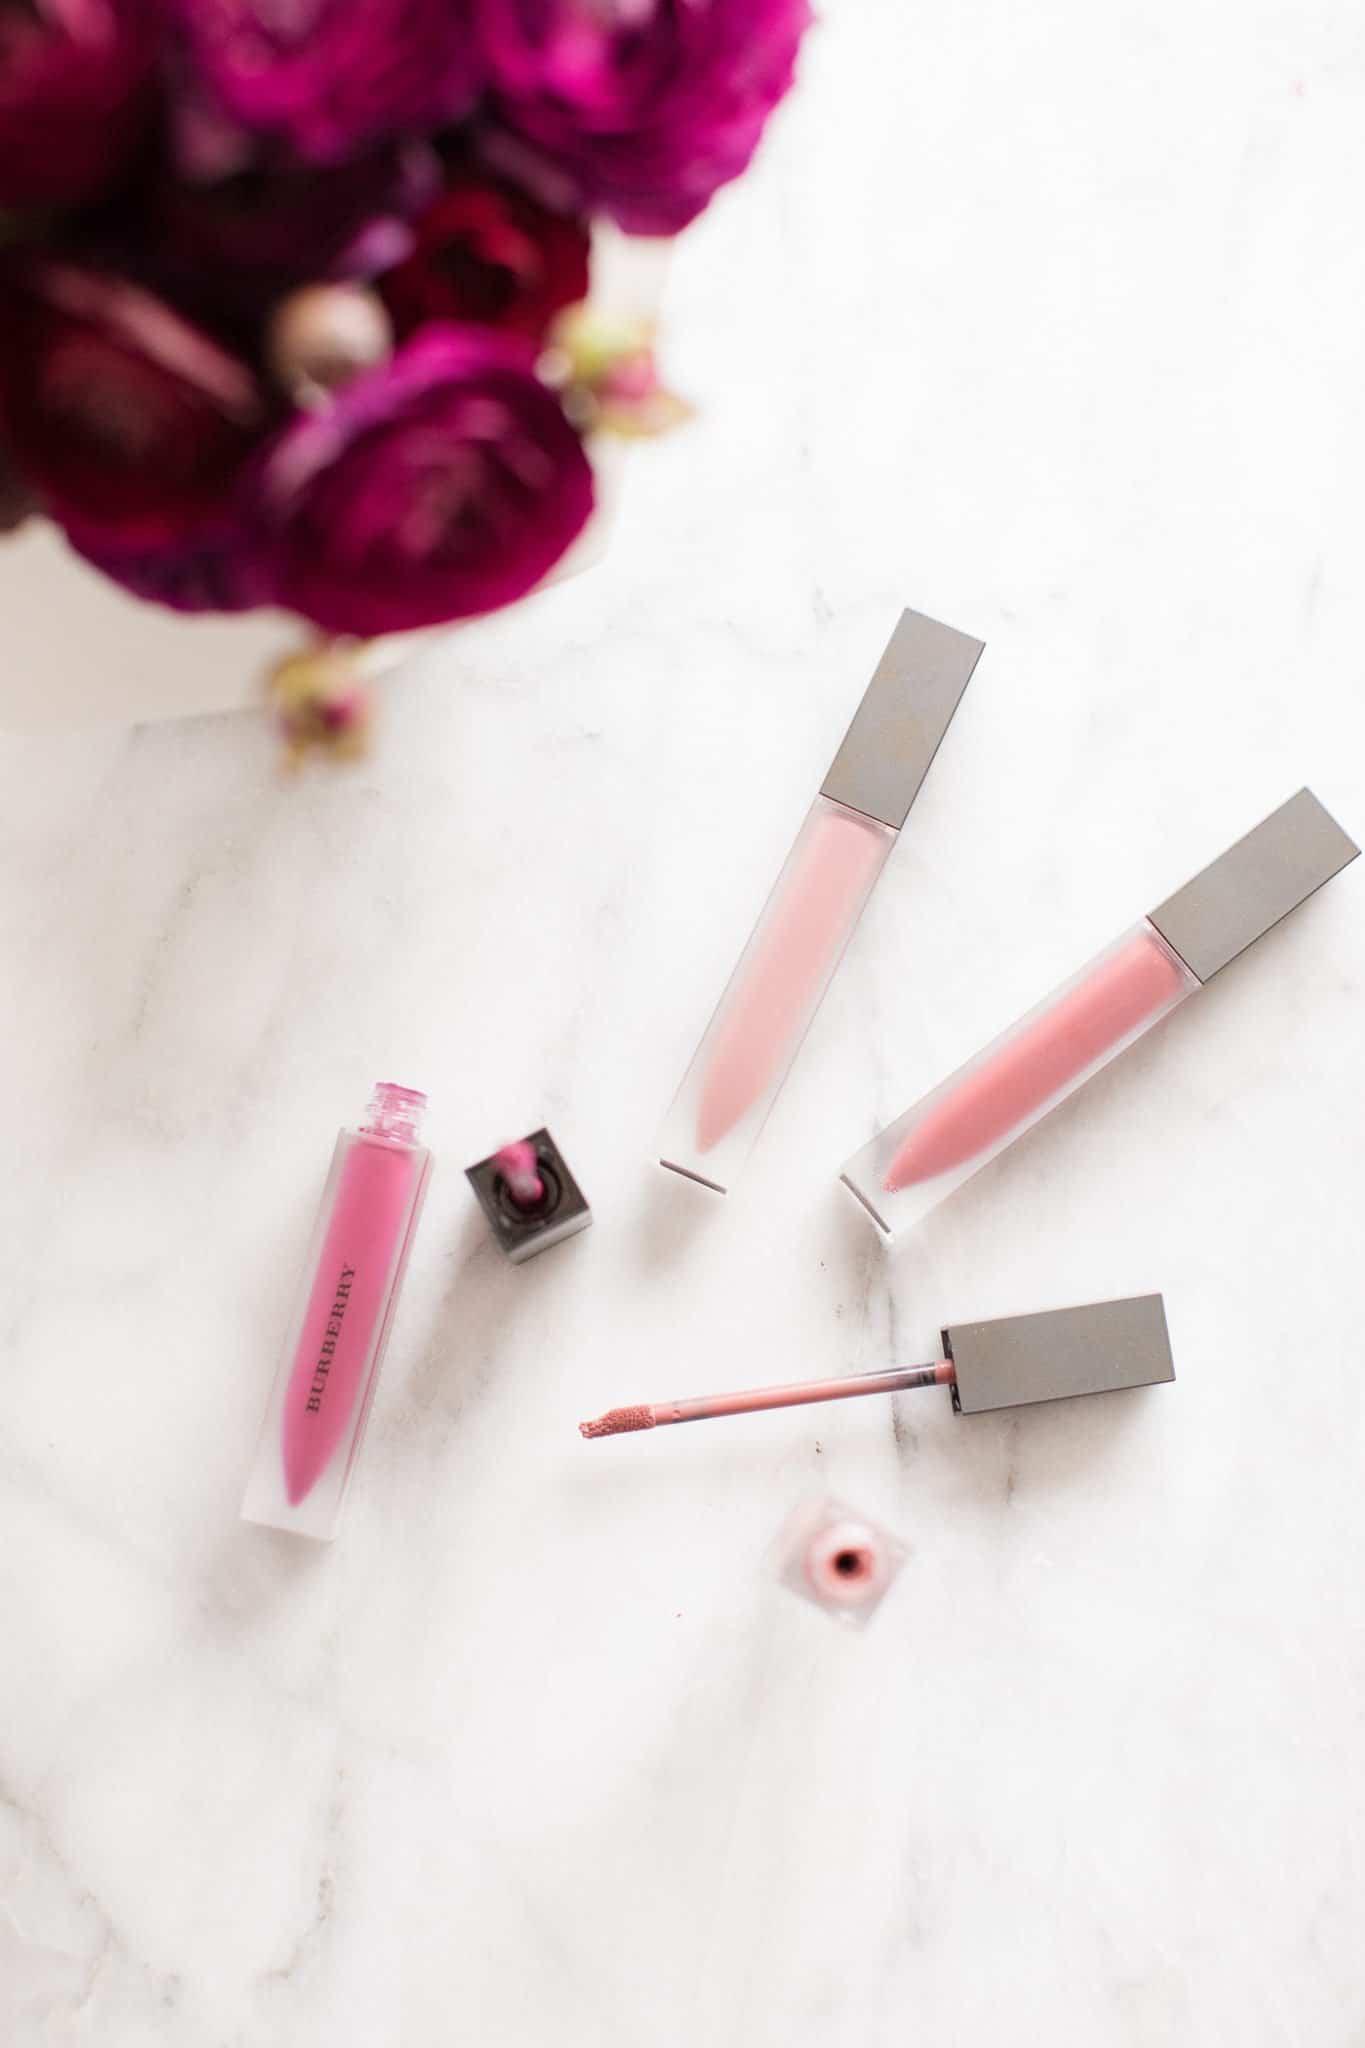 best luxury lipgloss, Burberry Velvet Matte Lipgloss - My Style Vita @mystylevita